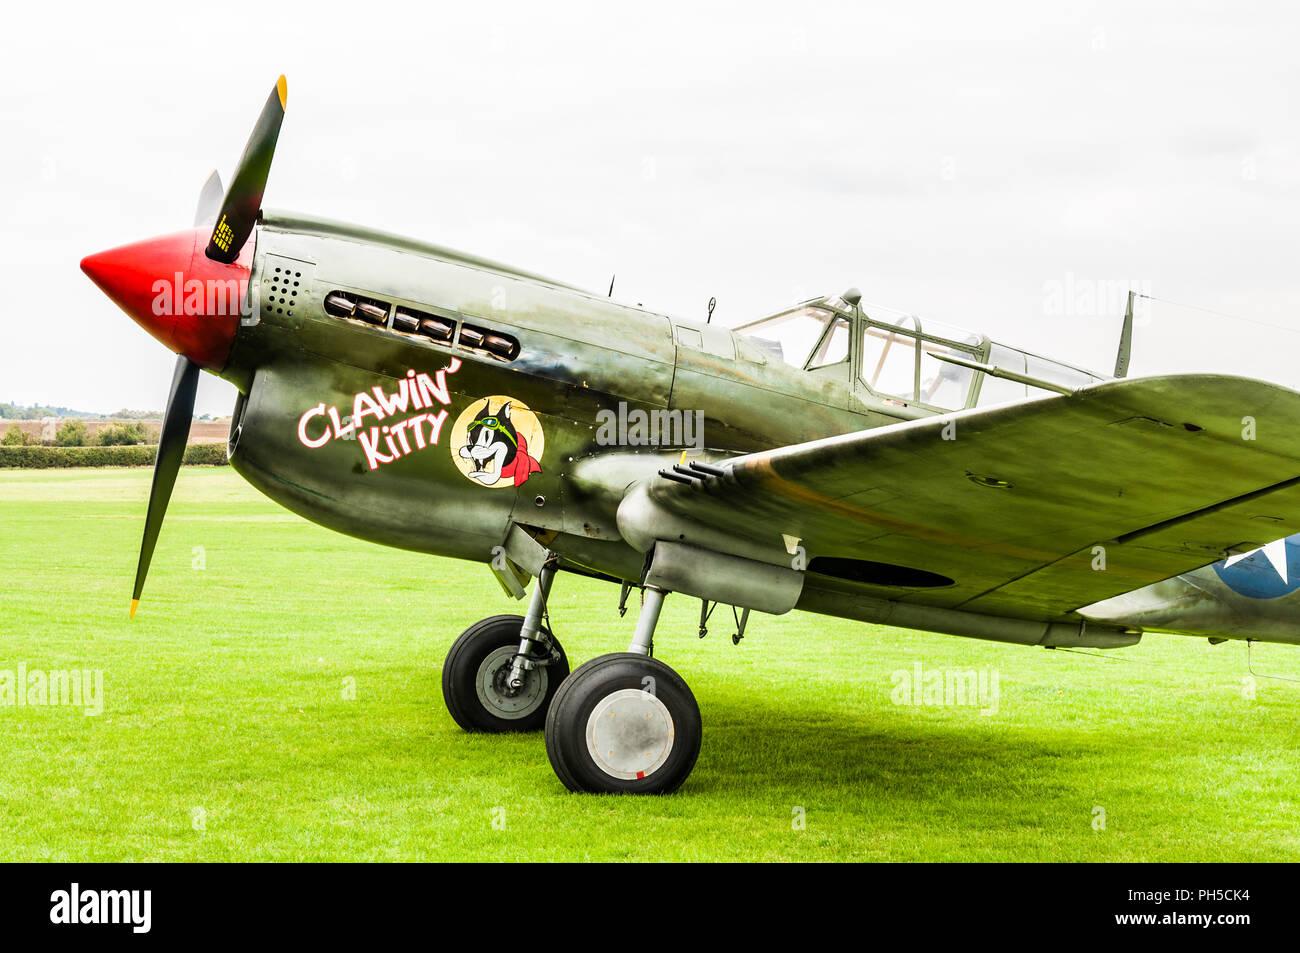 Curtiss P-40M Kittyhawk Clawin' Kitty jet plane - Stock Image